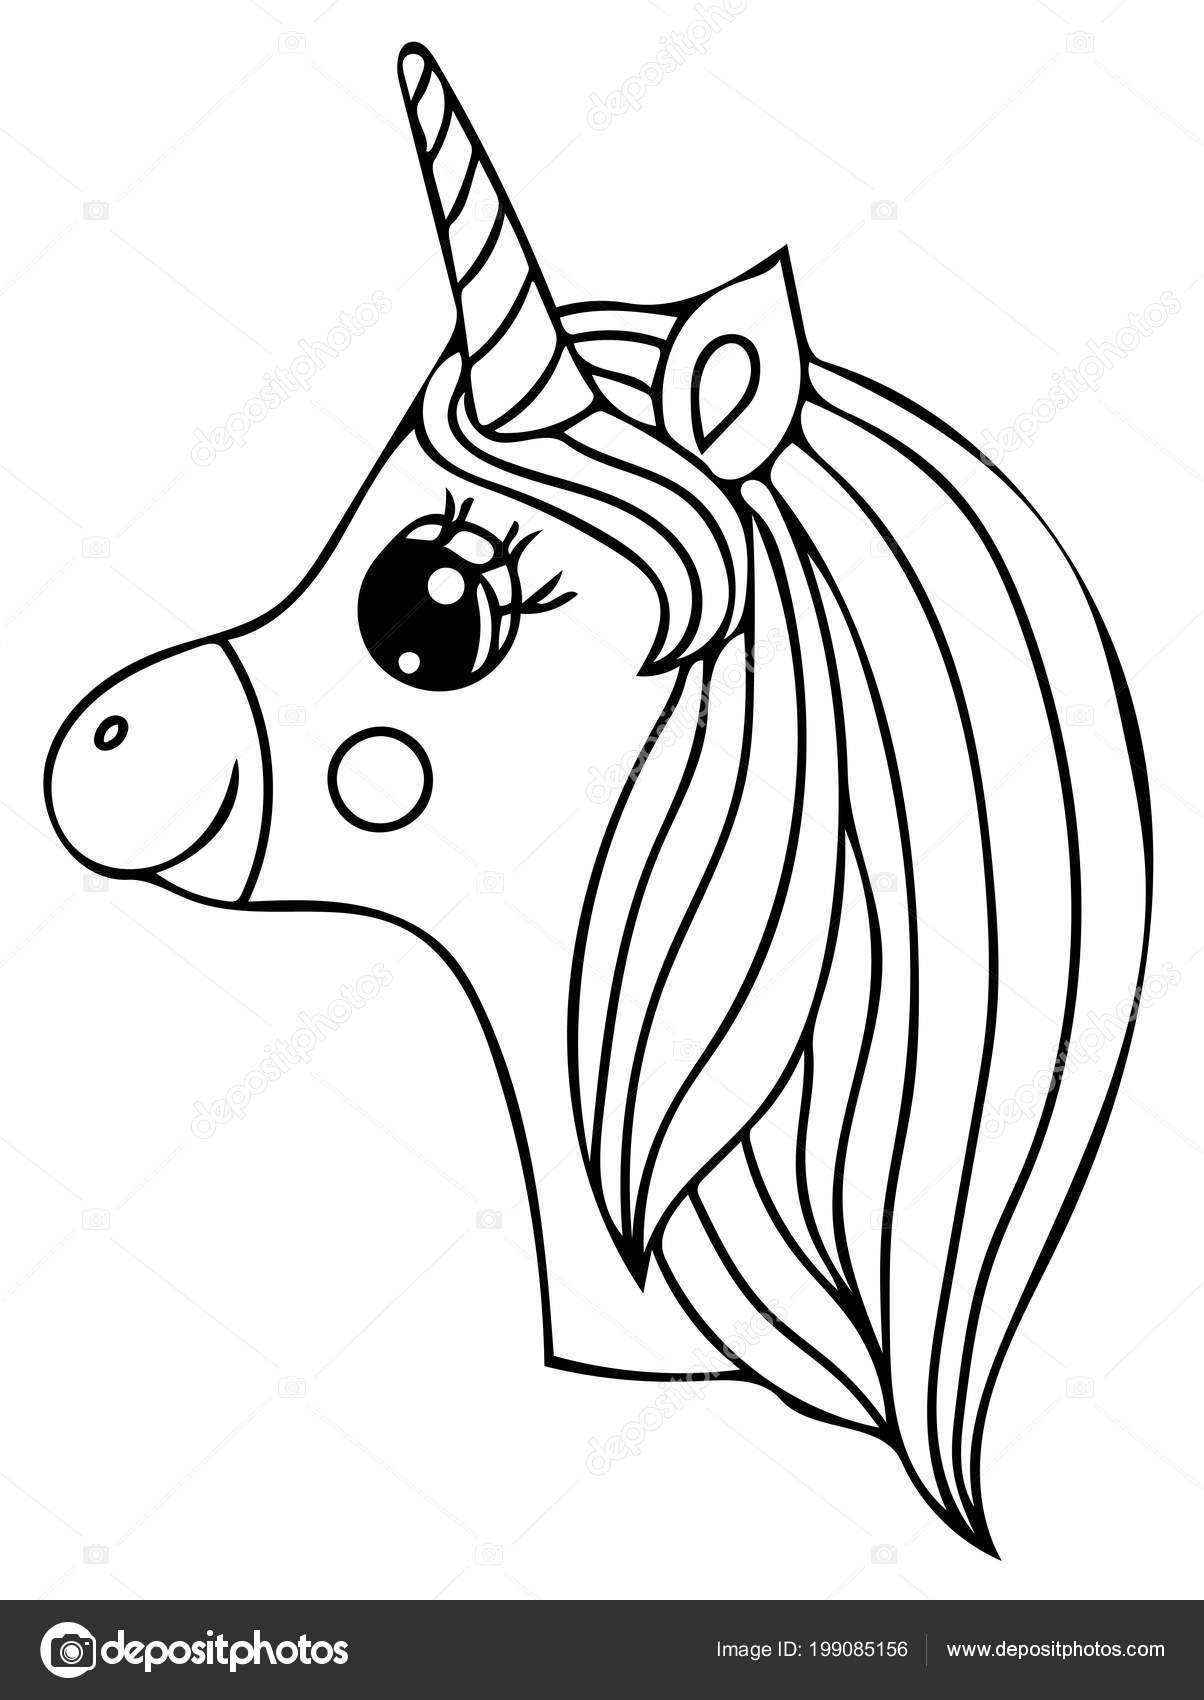 Unicorn Black Line Isolated Magical Cute Animal Vector Artwork